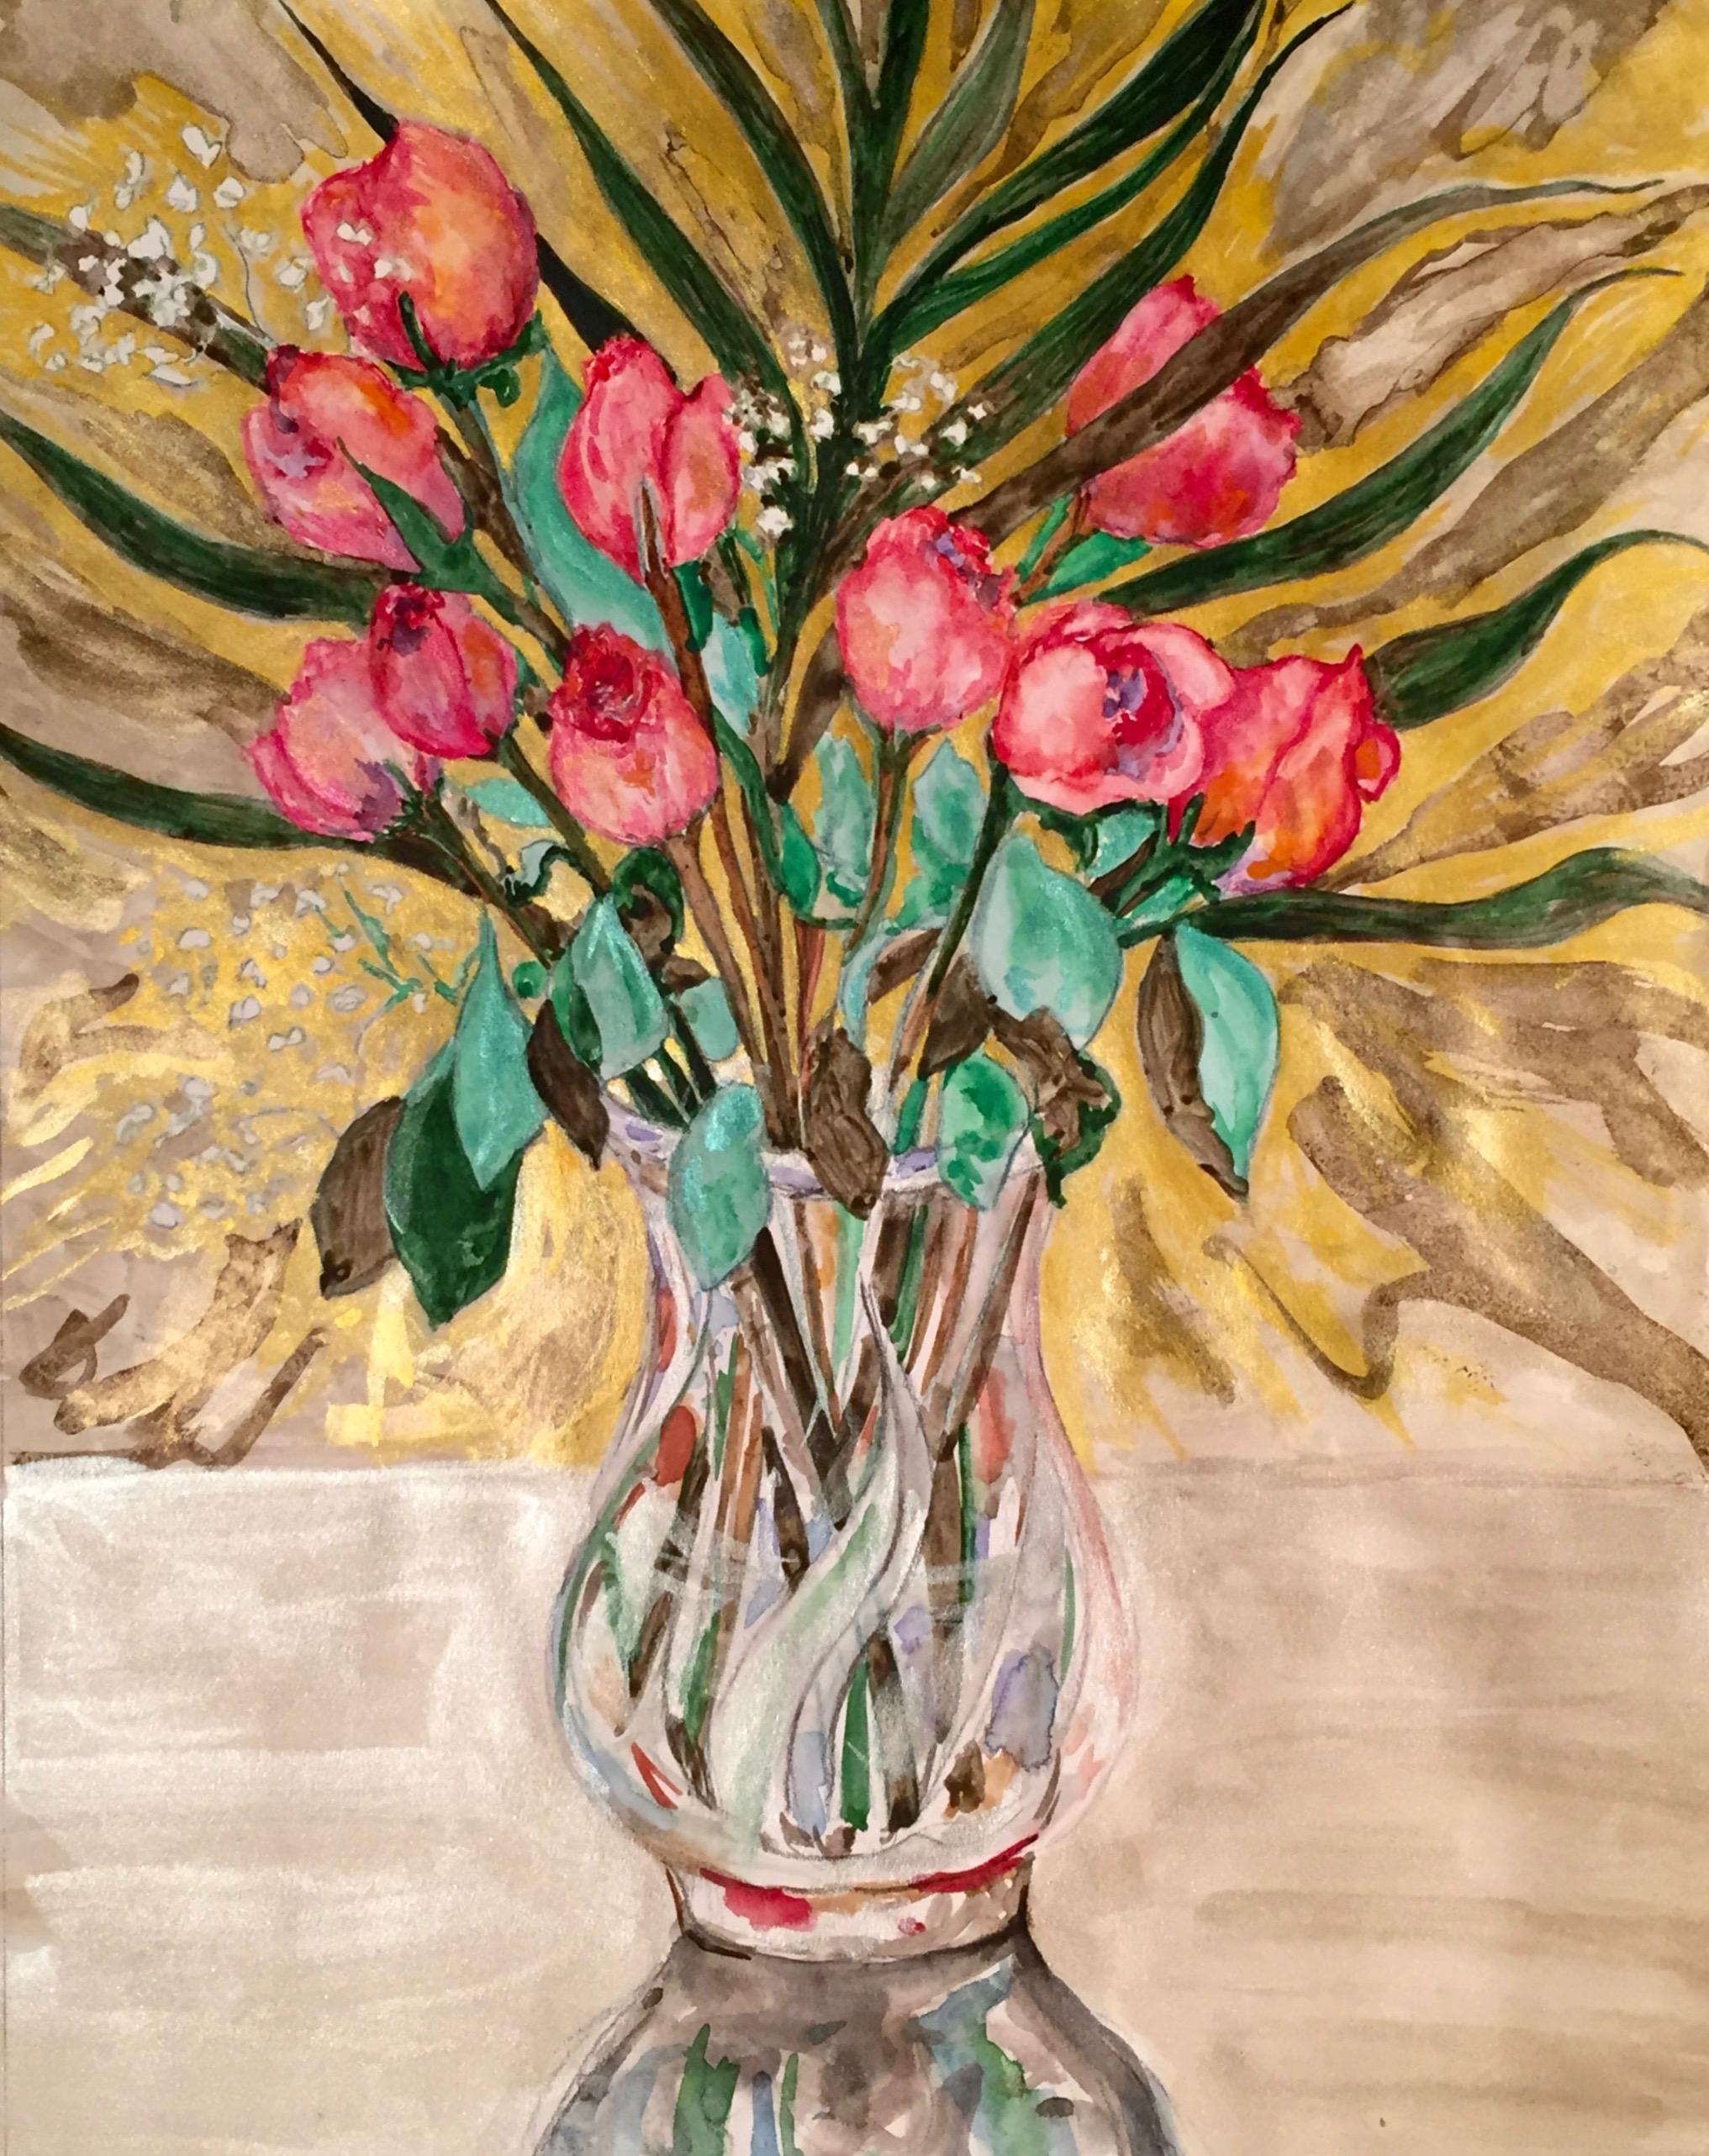 Pink roses in a crystal vase